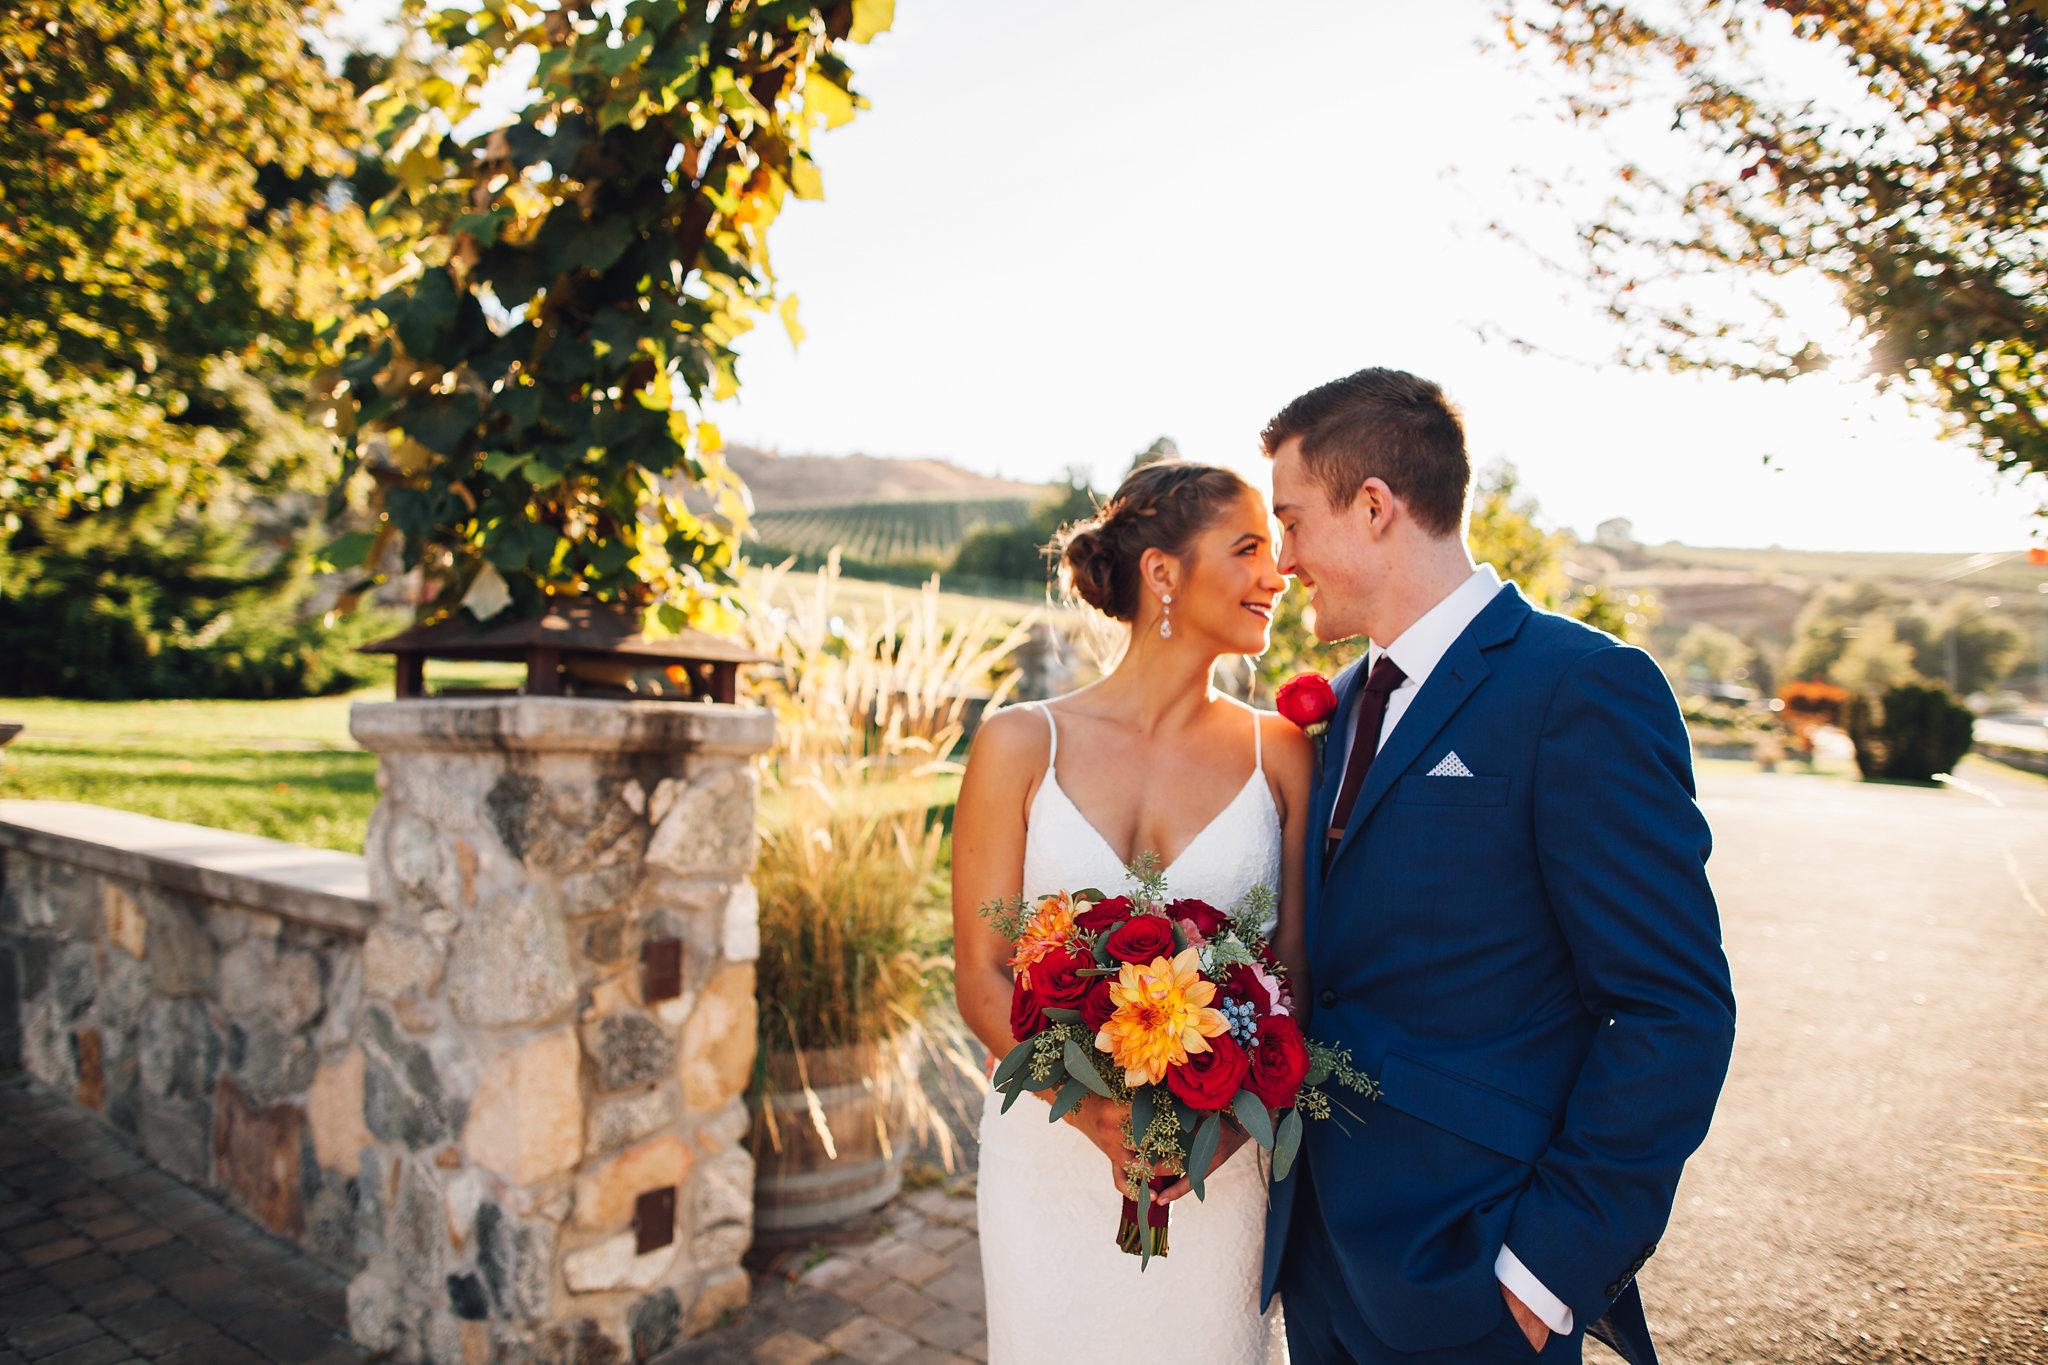 brill-hoffman-wedding-web-230.jpg